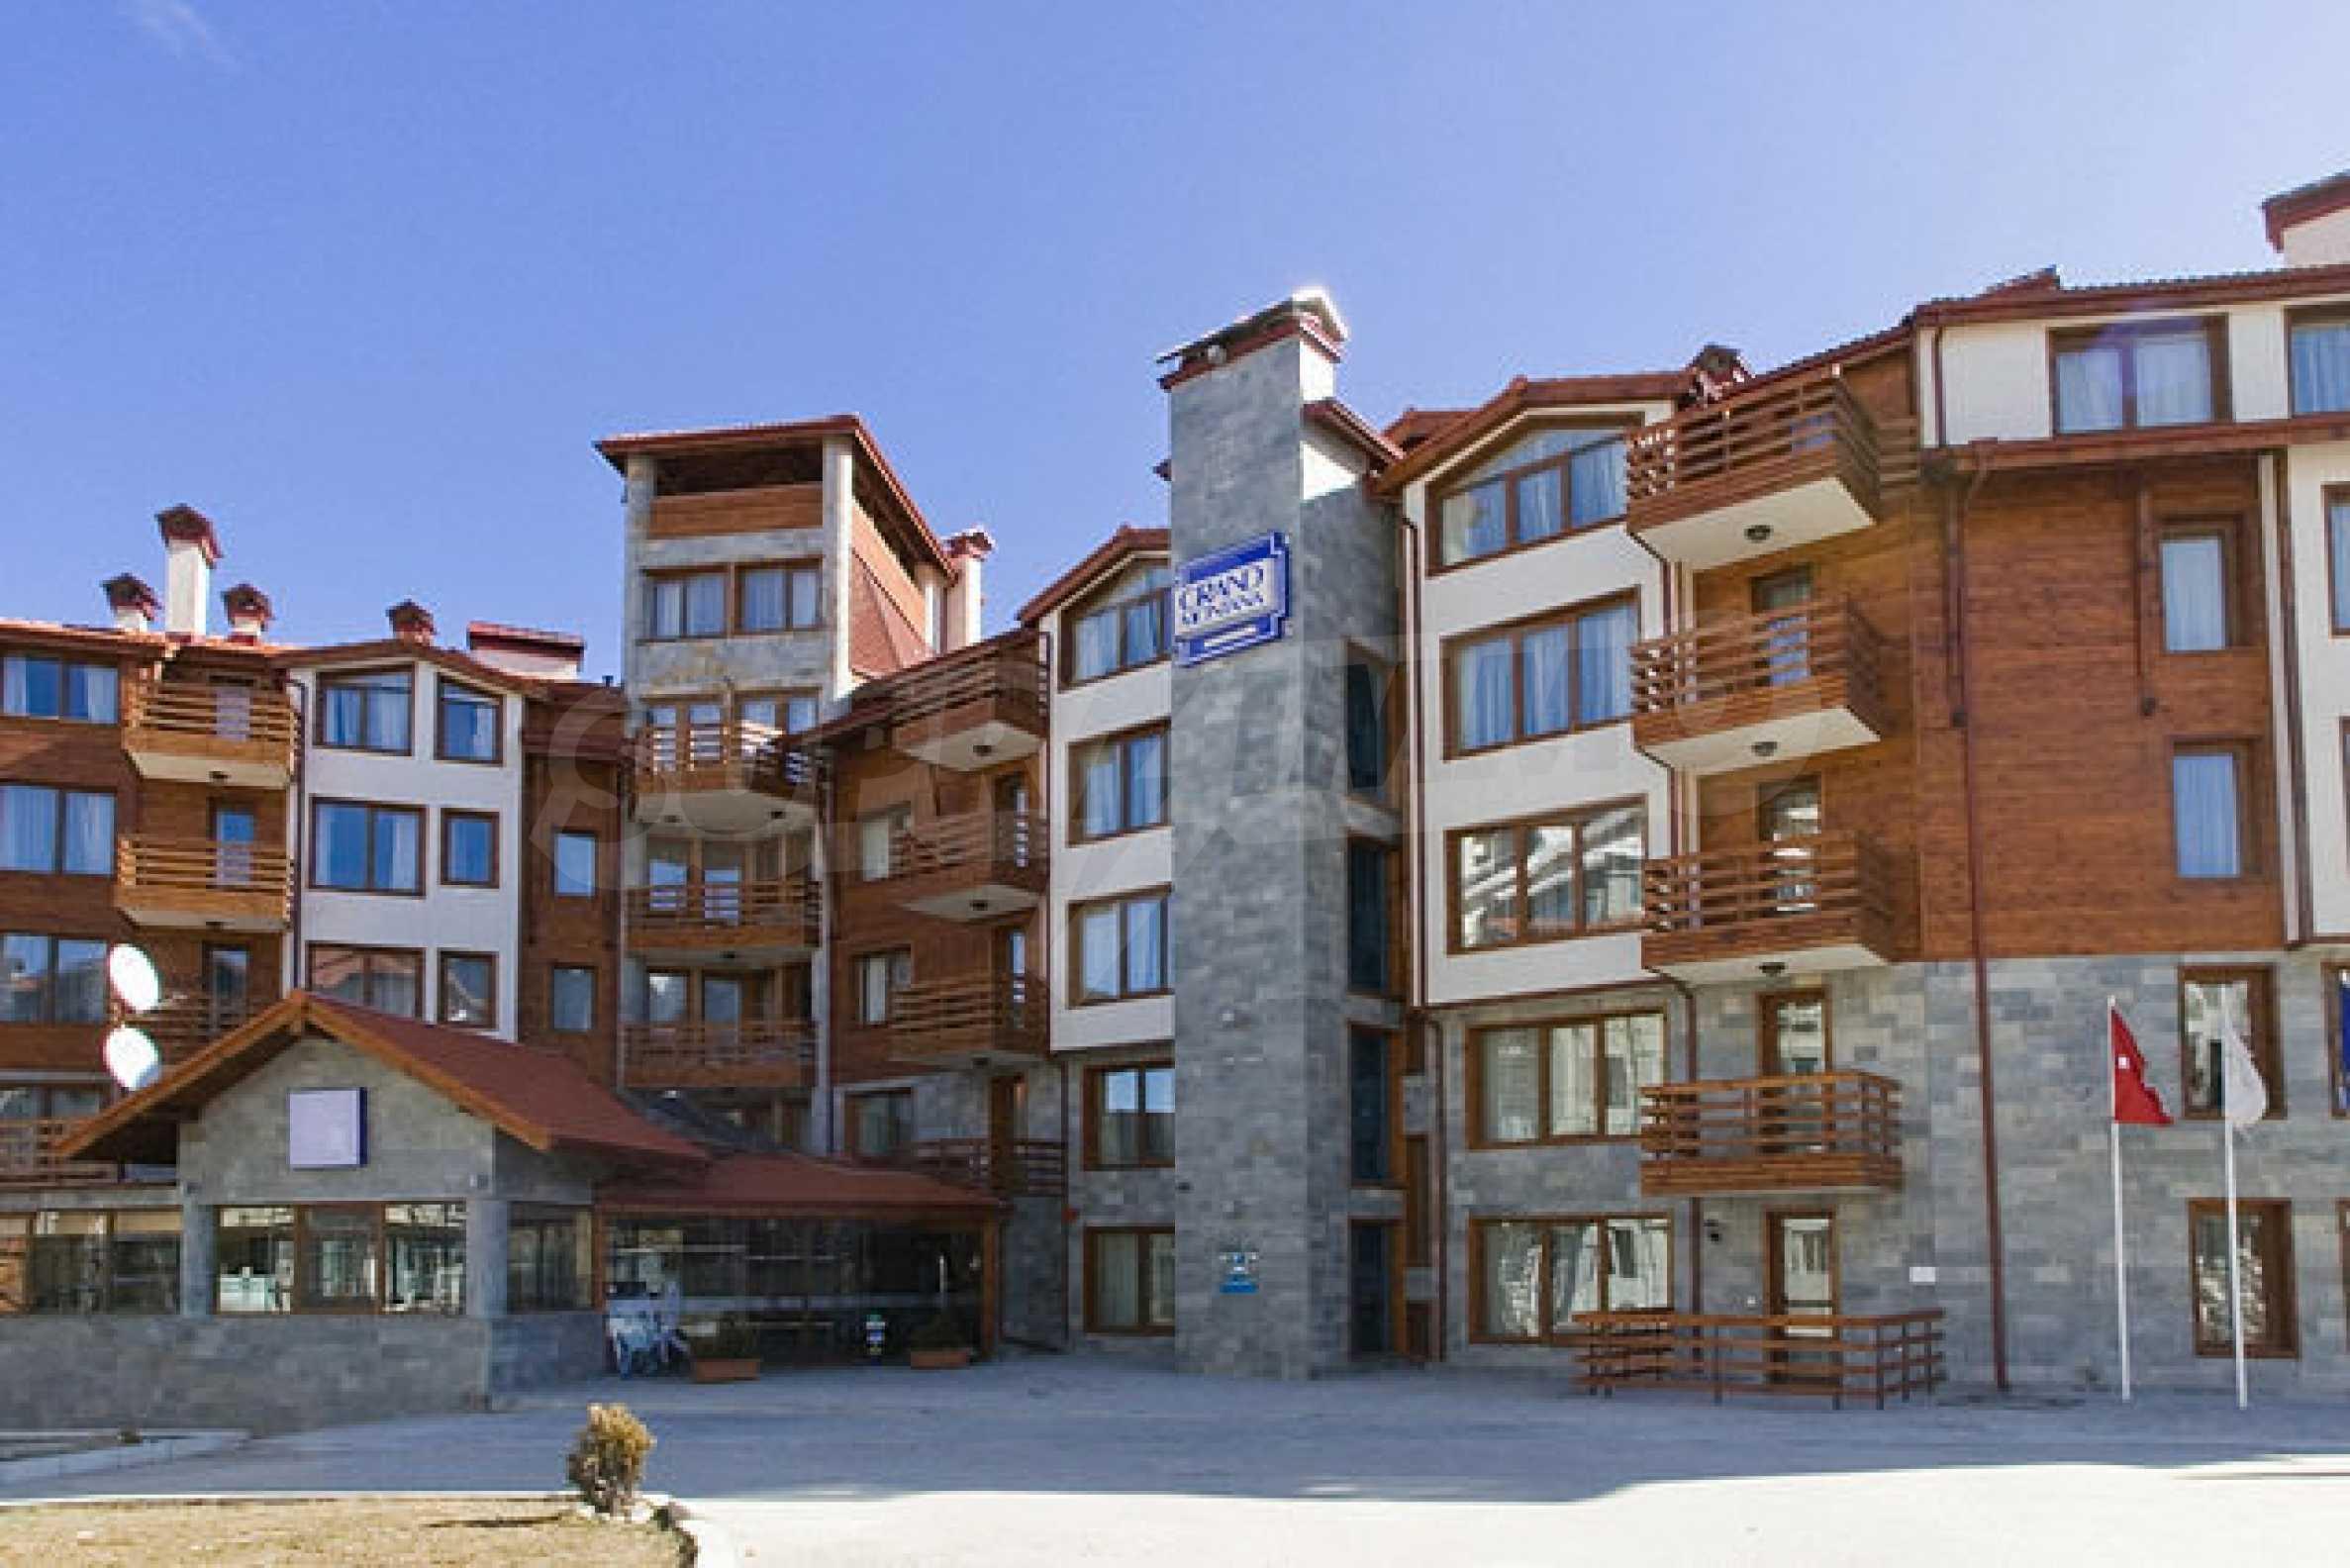 Двустаен апартамент за продажба в гр. Банско 9